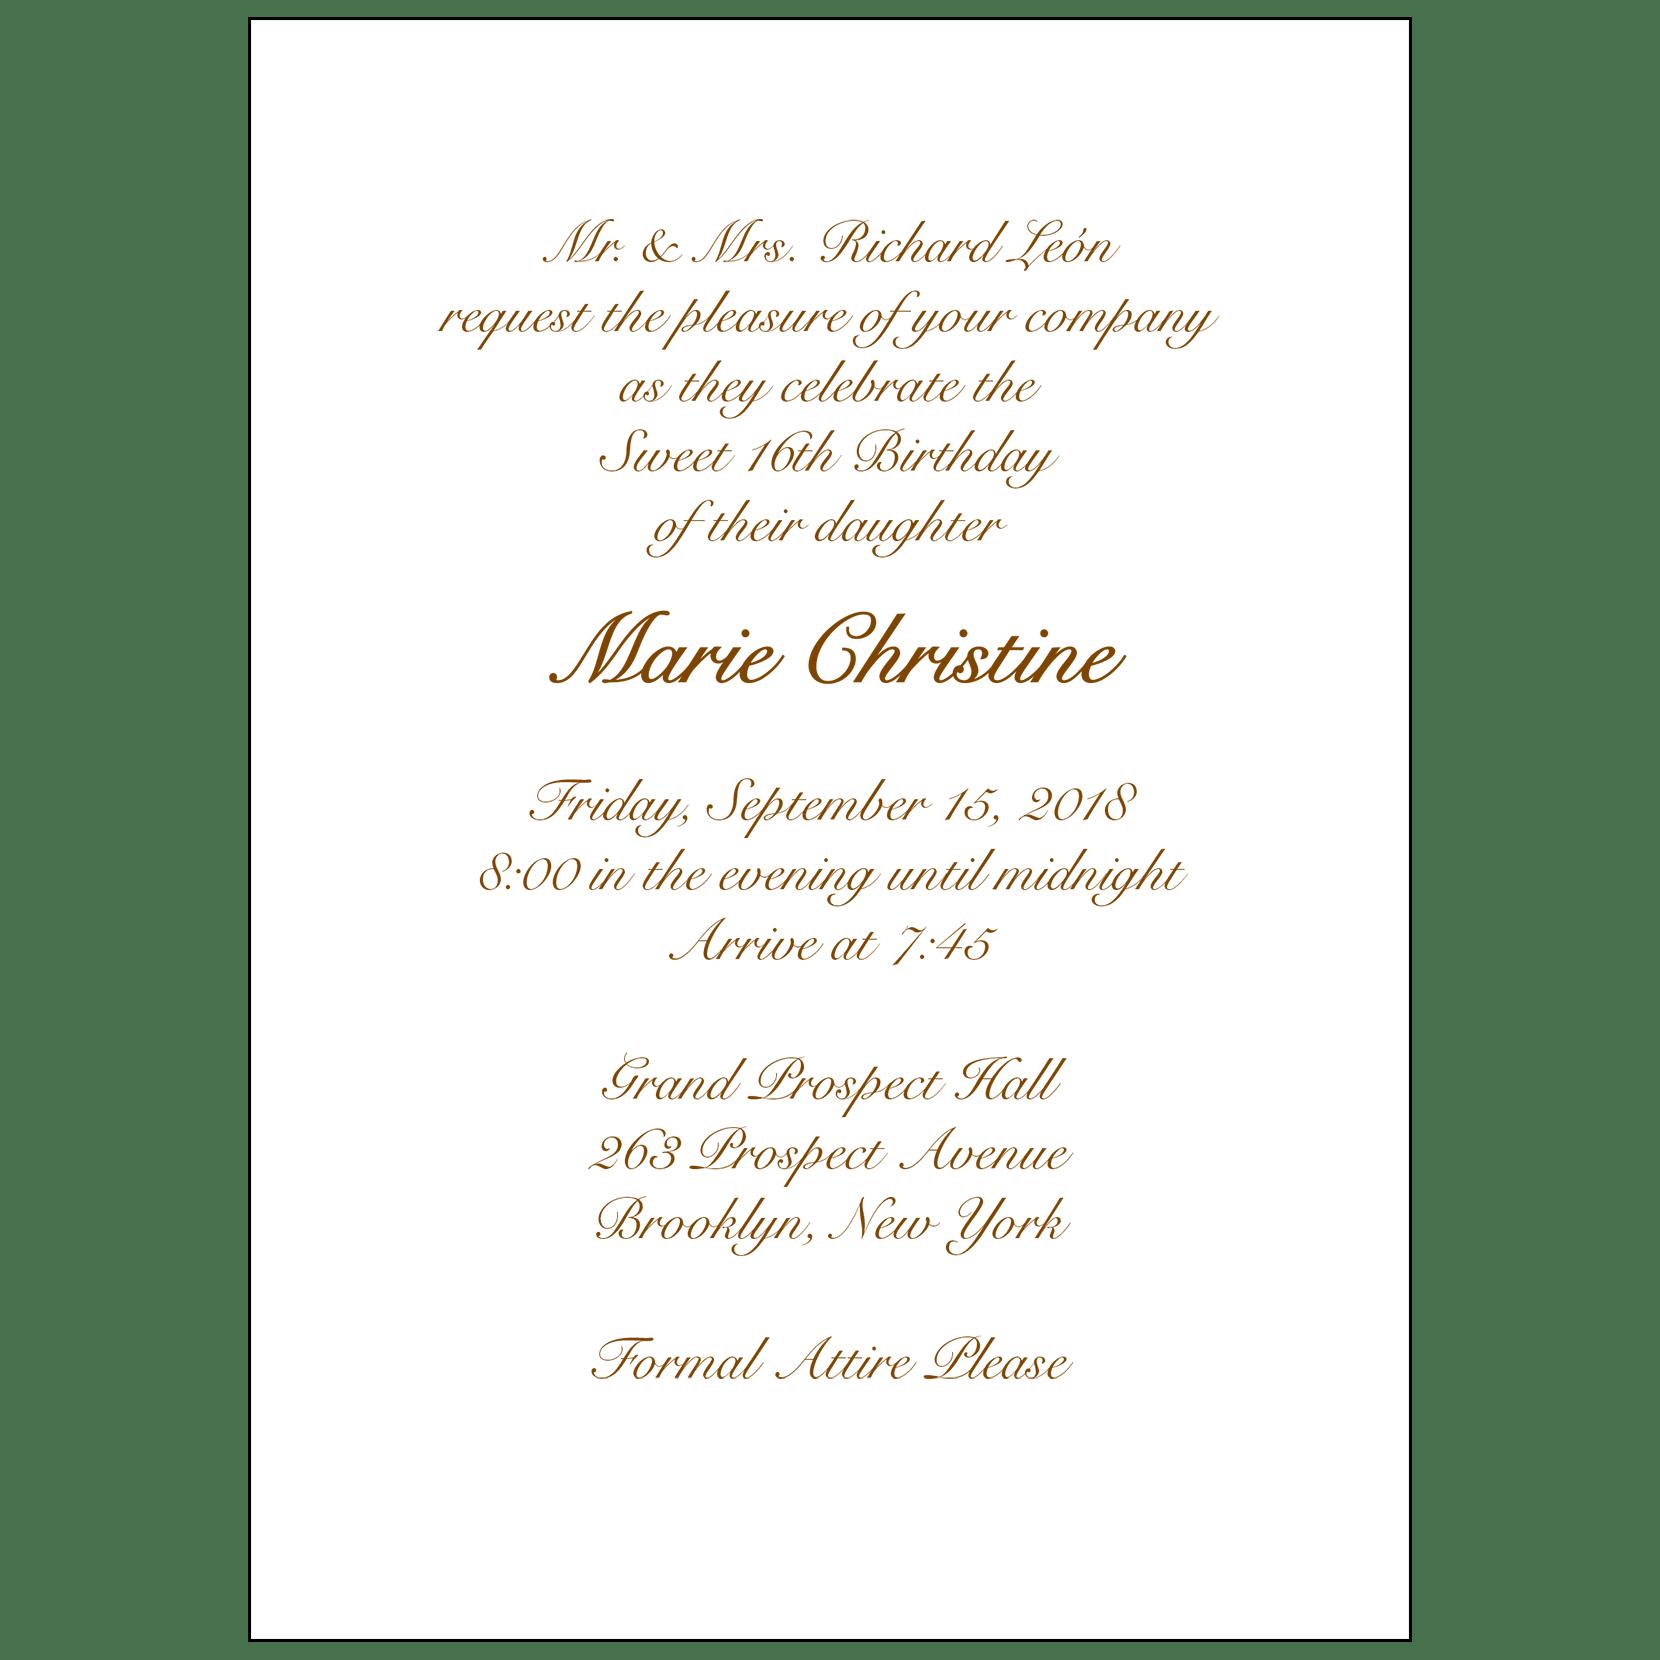 Sweet sixteen invitation style 1 sample a ipv studio text inside sweet 16 invitation stopboris Image collections